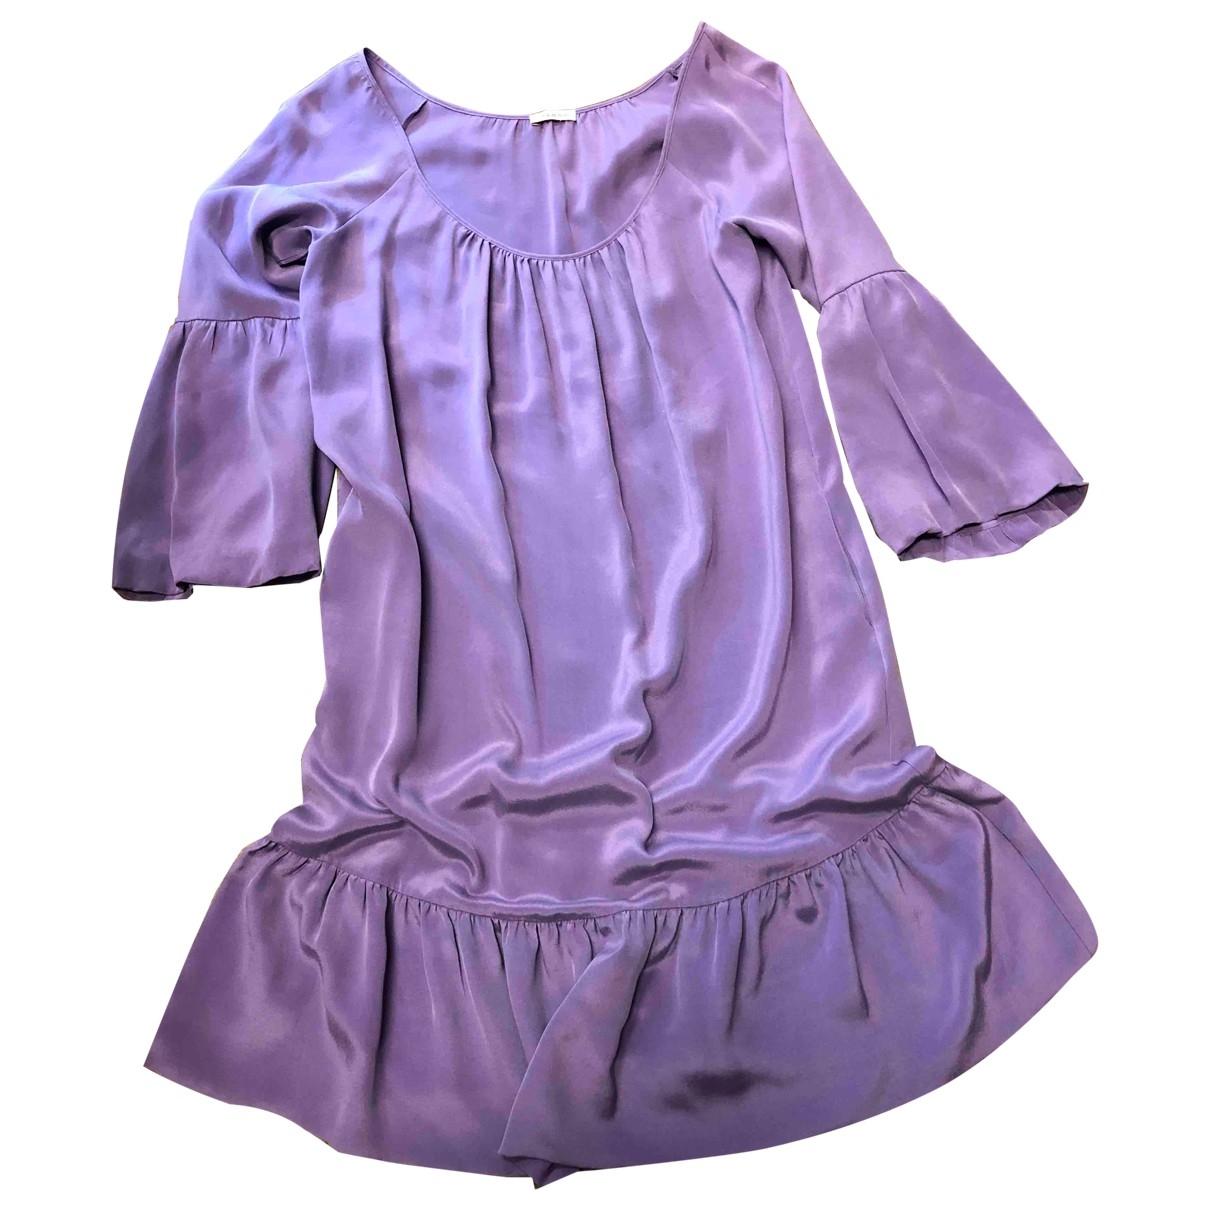 Parosh \N Silk dress for Women S International